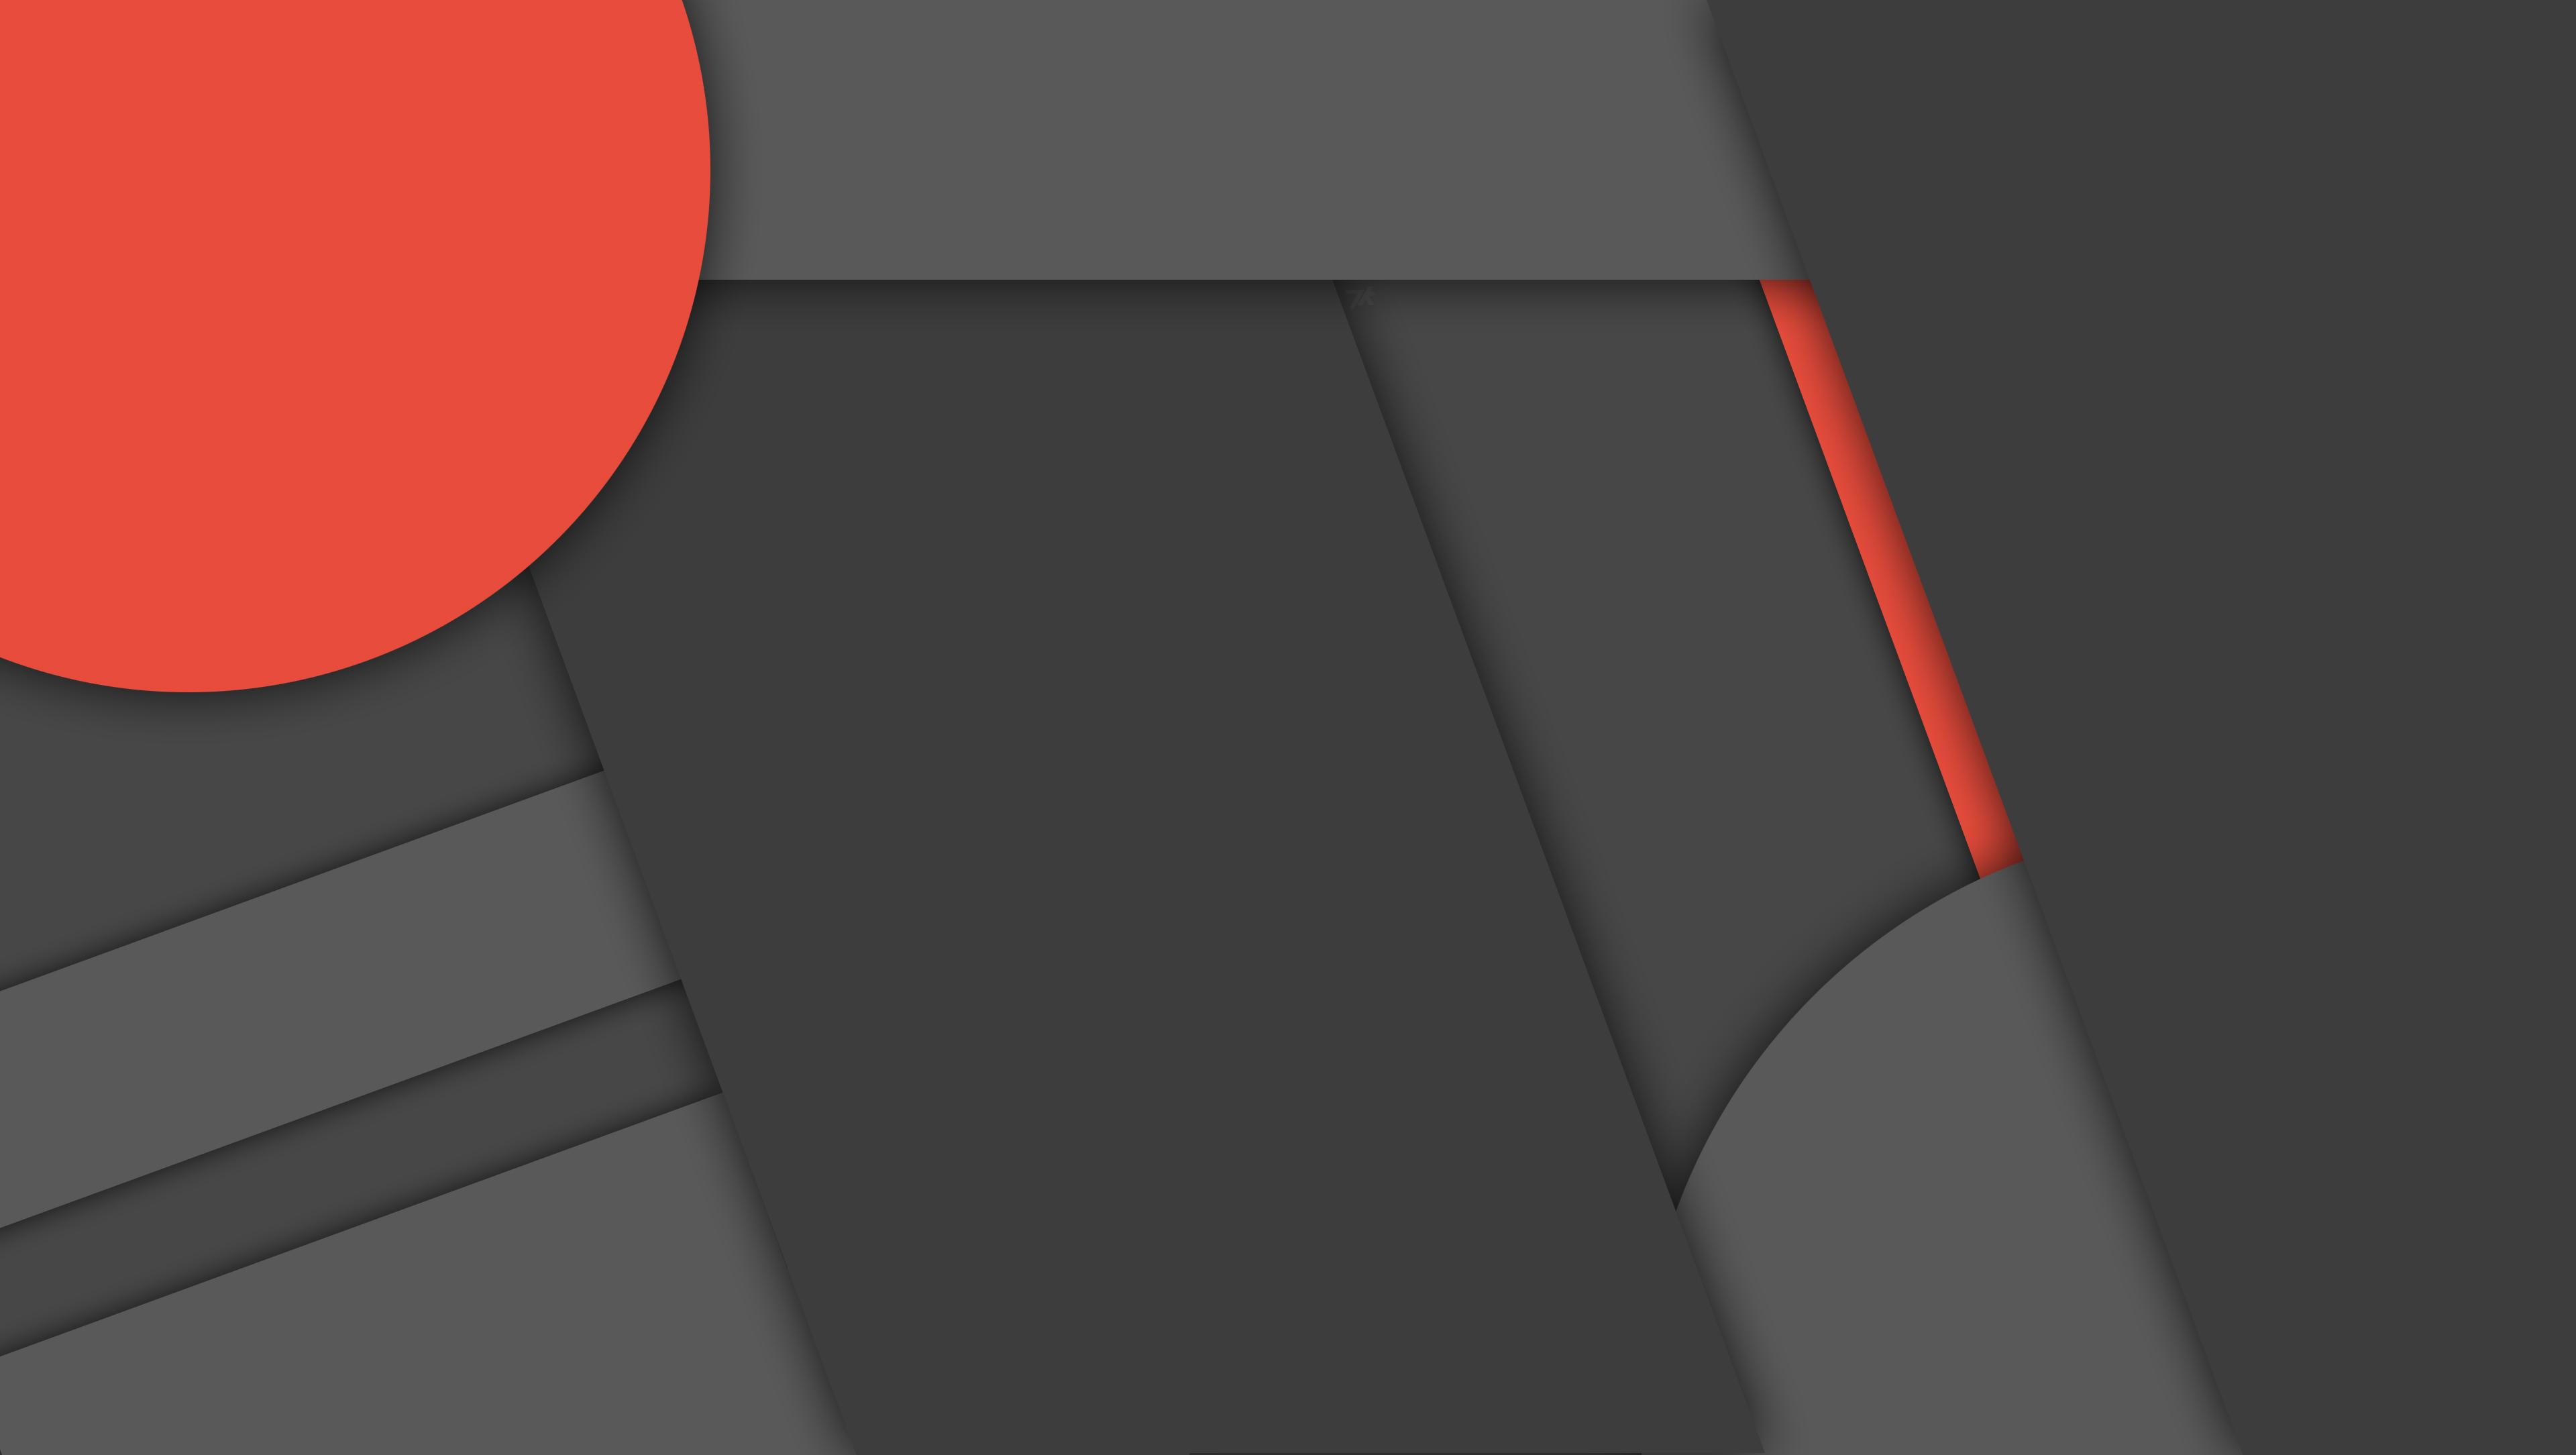 40 Best Material Design Wallpapers 4k 2016 Hd Windows 7 8 10